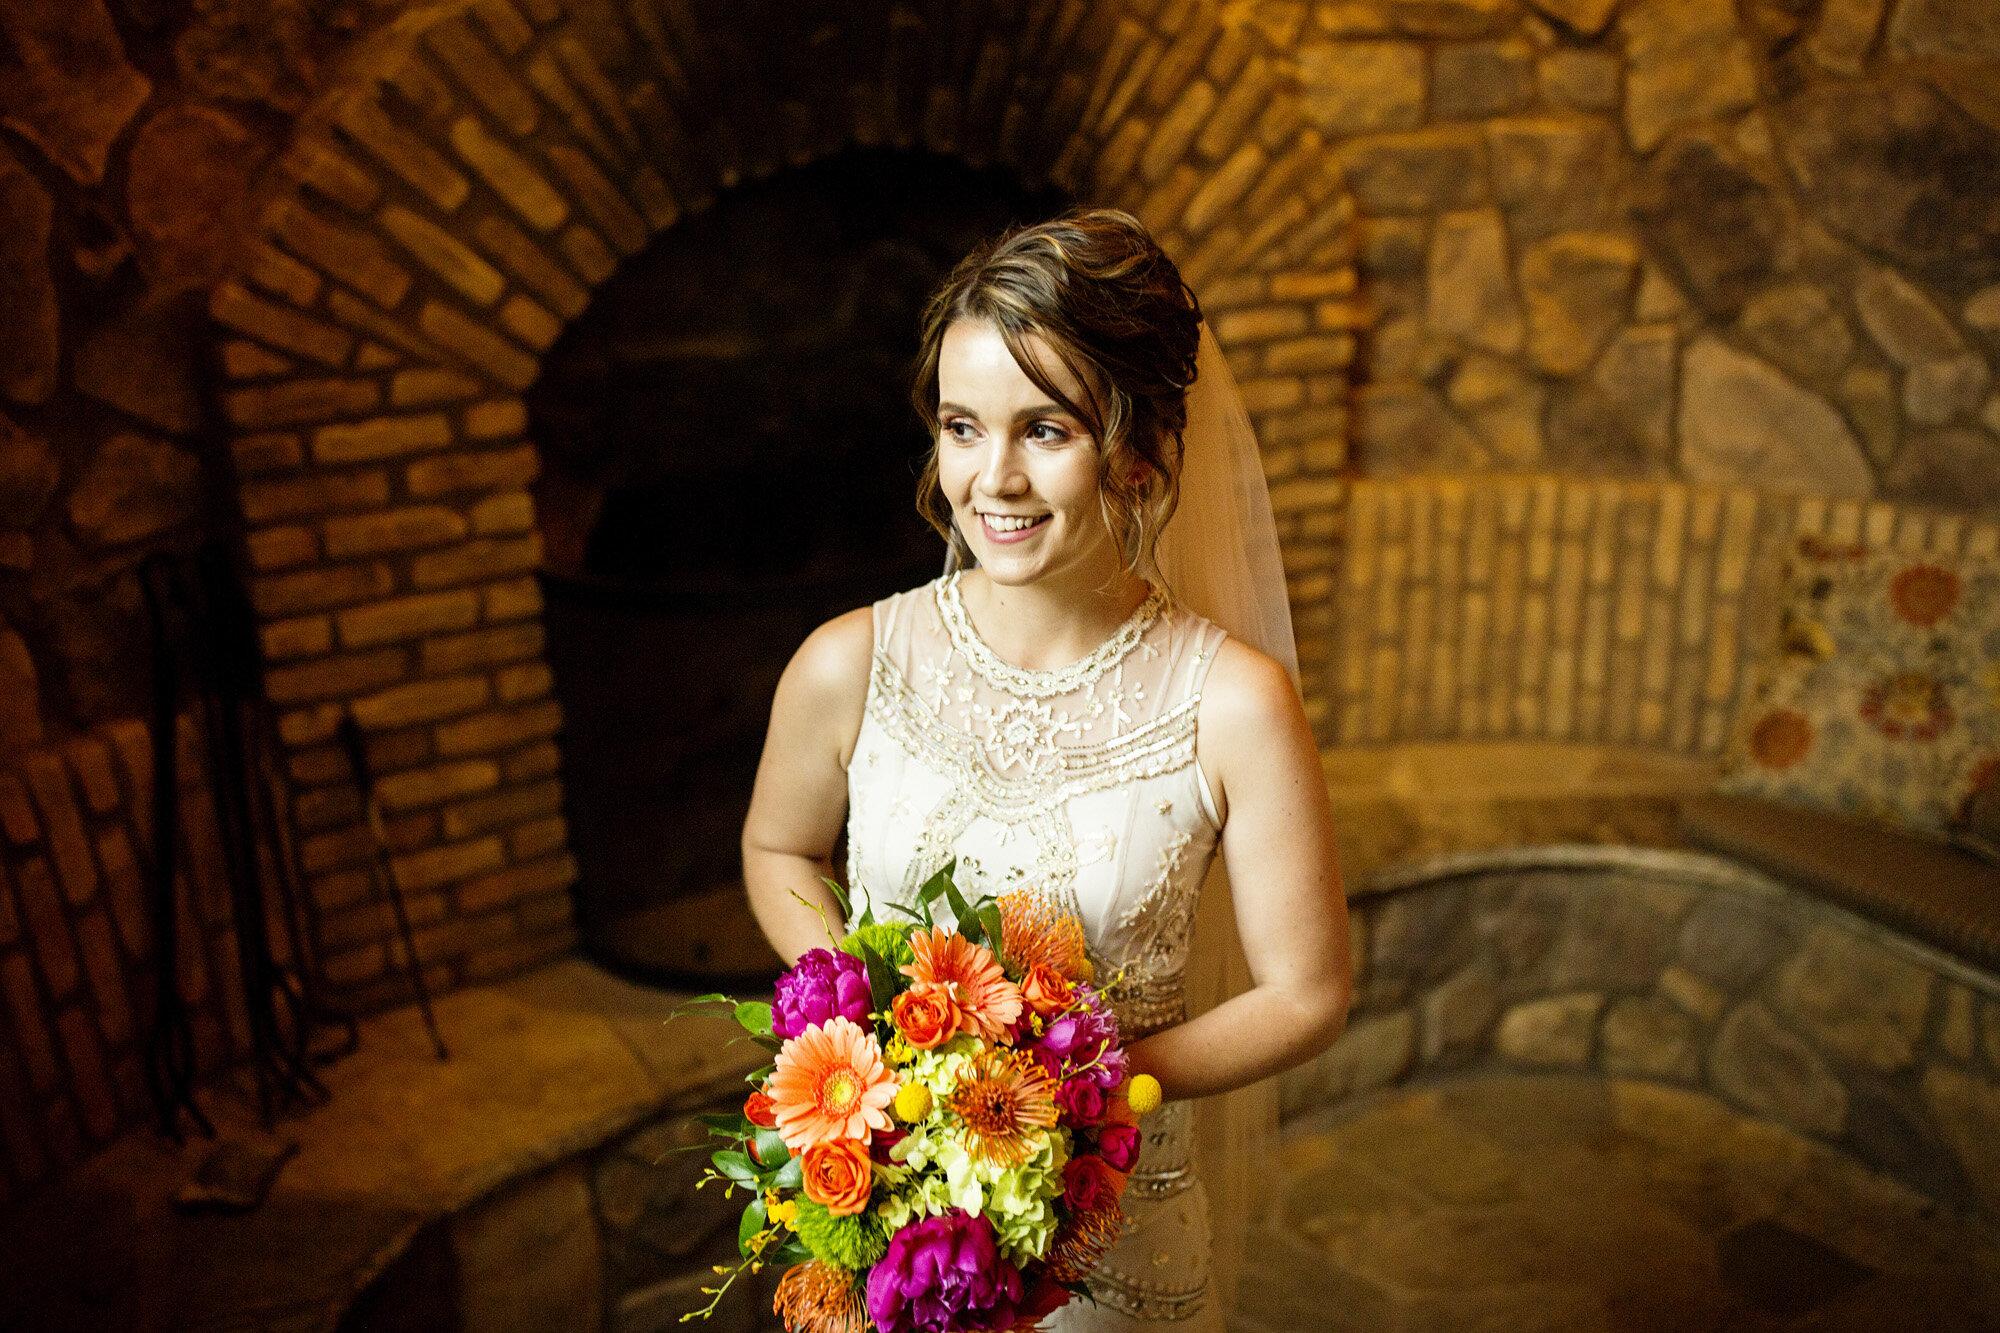 Seriously_Sabrina_Photography_Colorado_Springs_Club_at_Flying_Horse_Destination_Wedding_ODwyer20.jpg